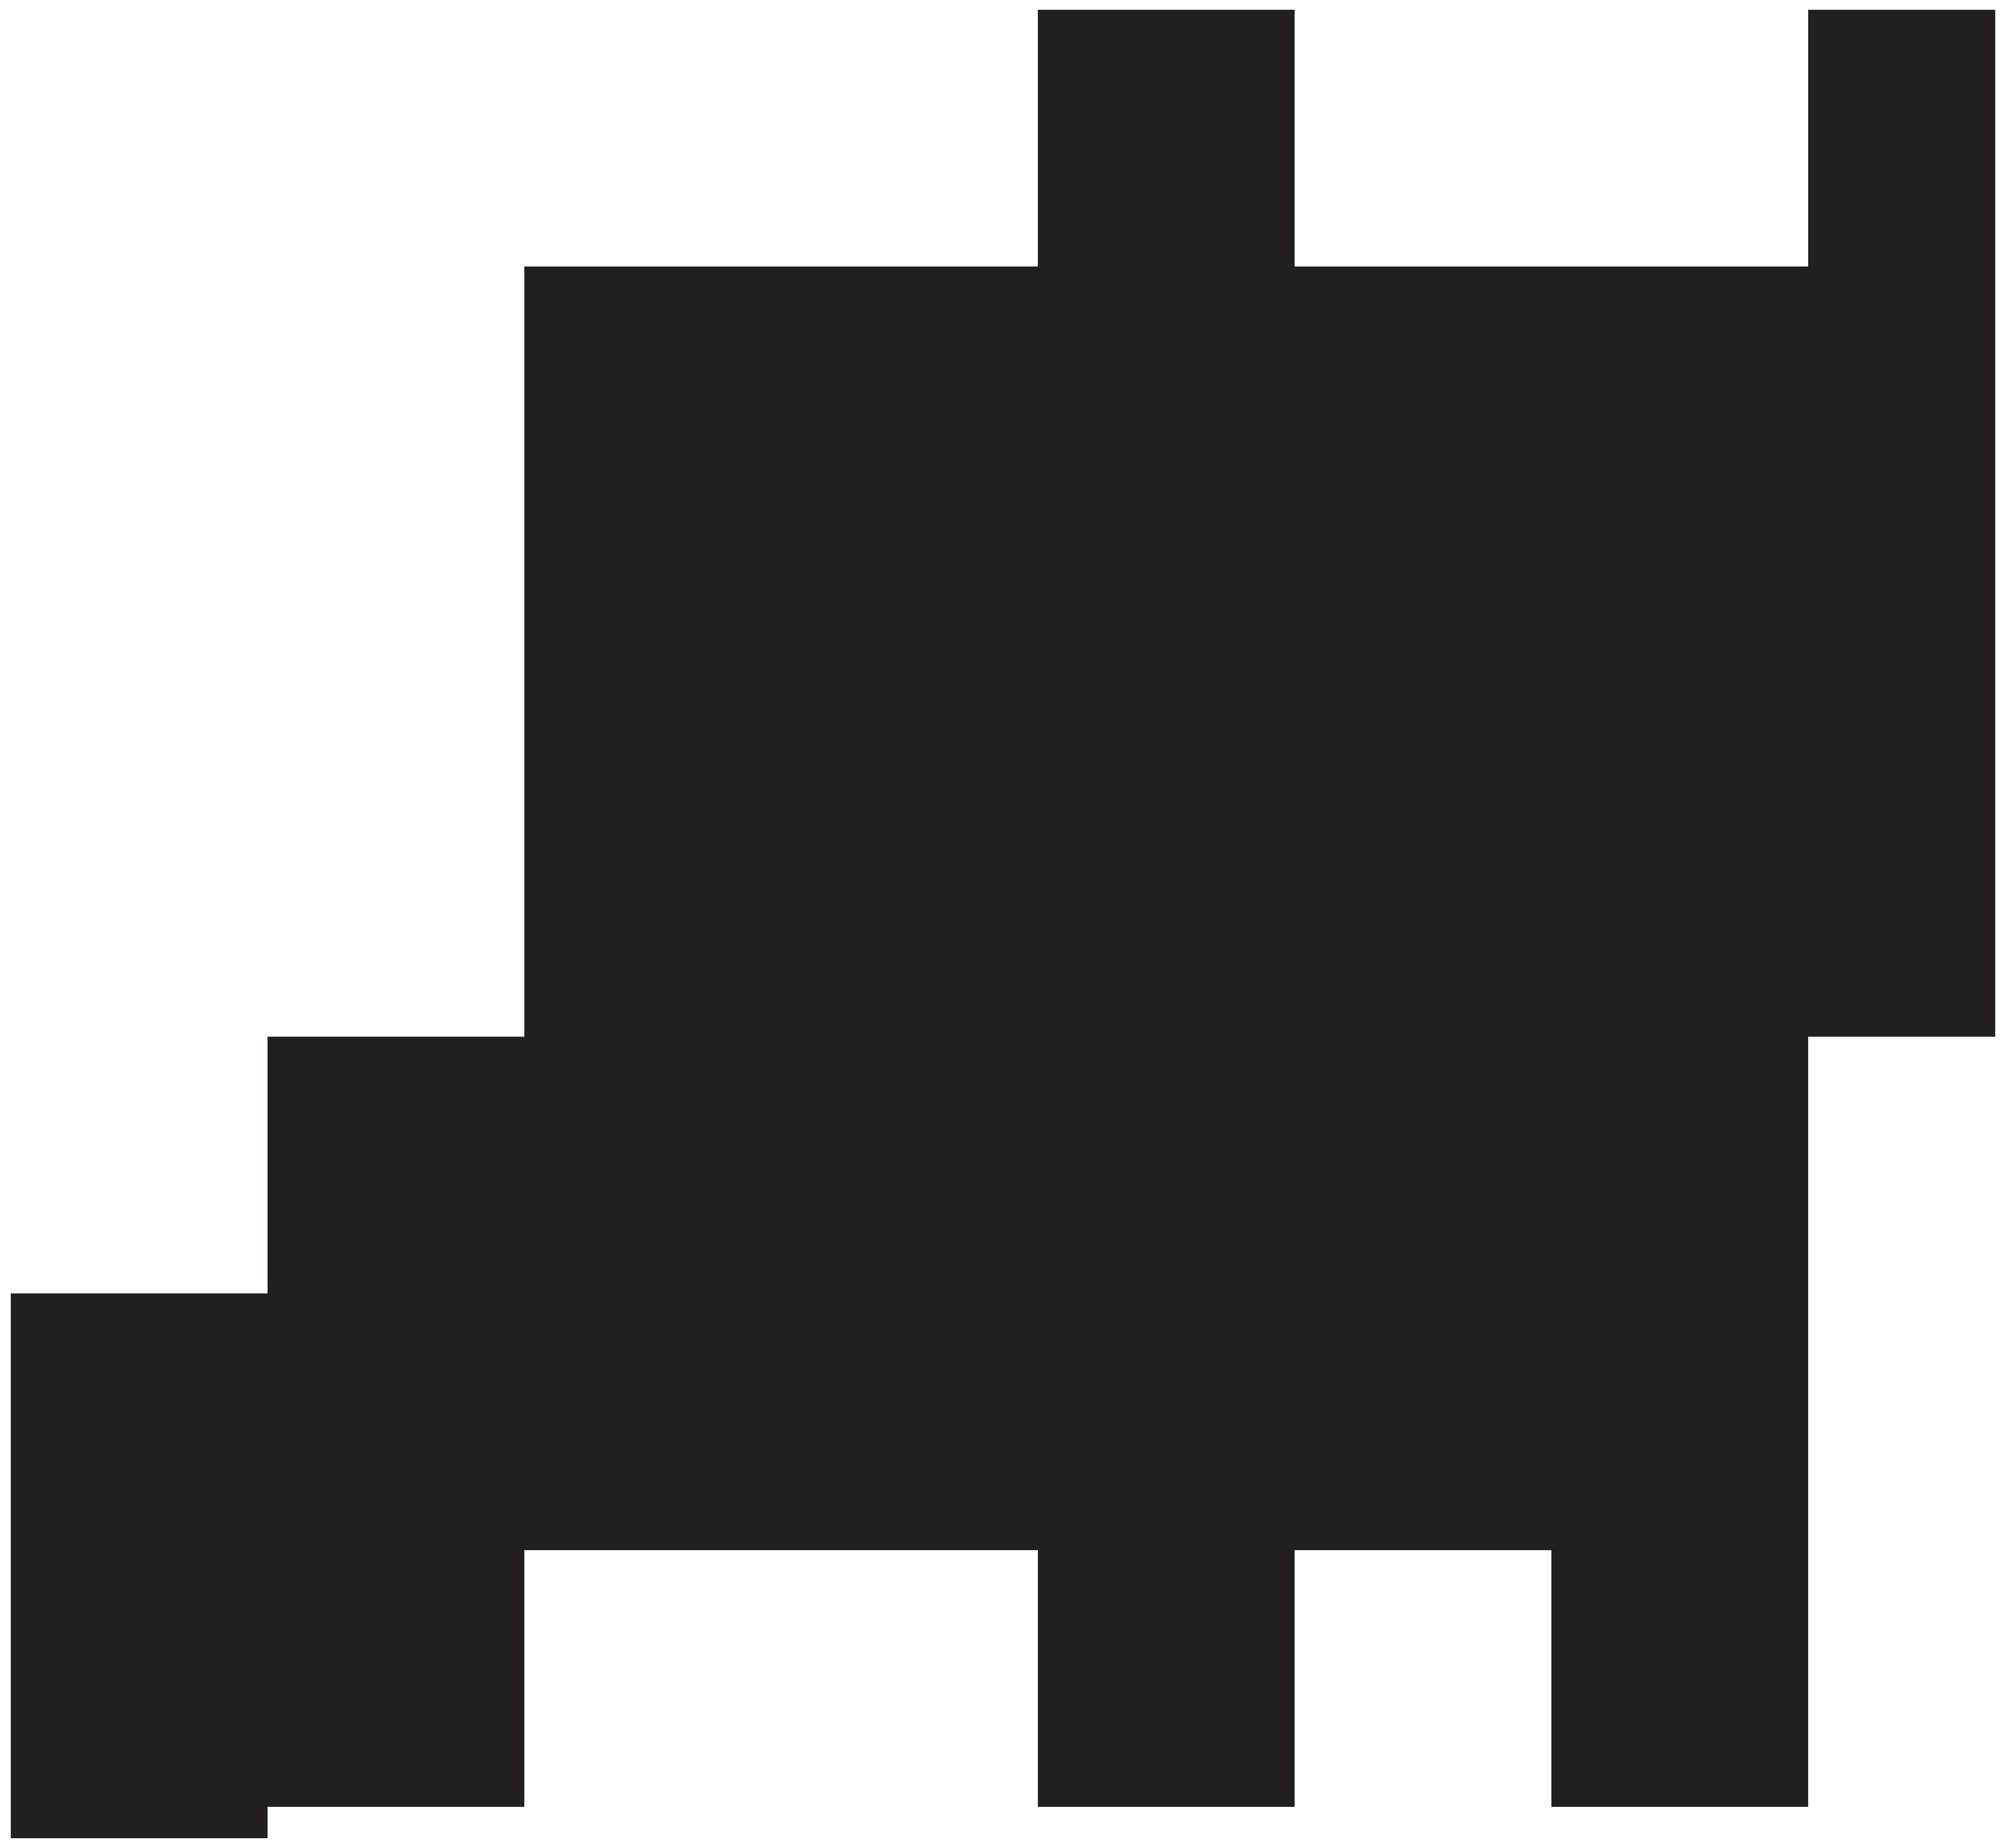 8000x7371 Png Fairy Mydrlynx